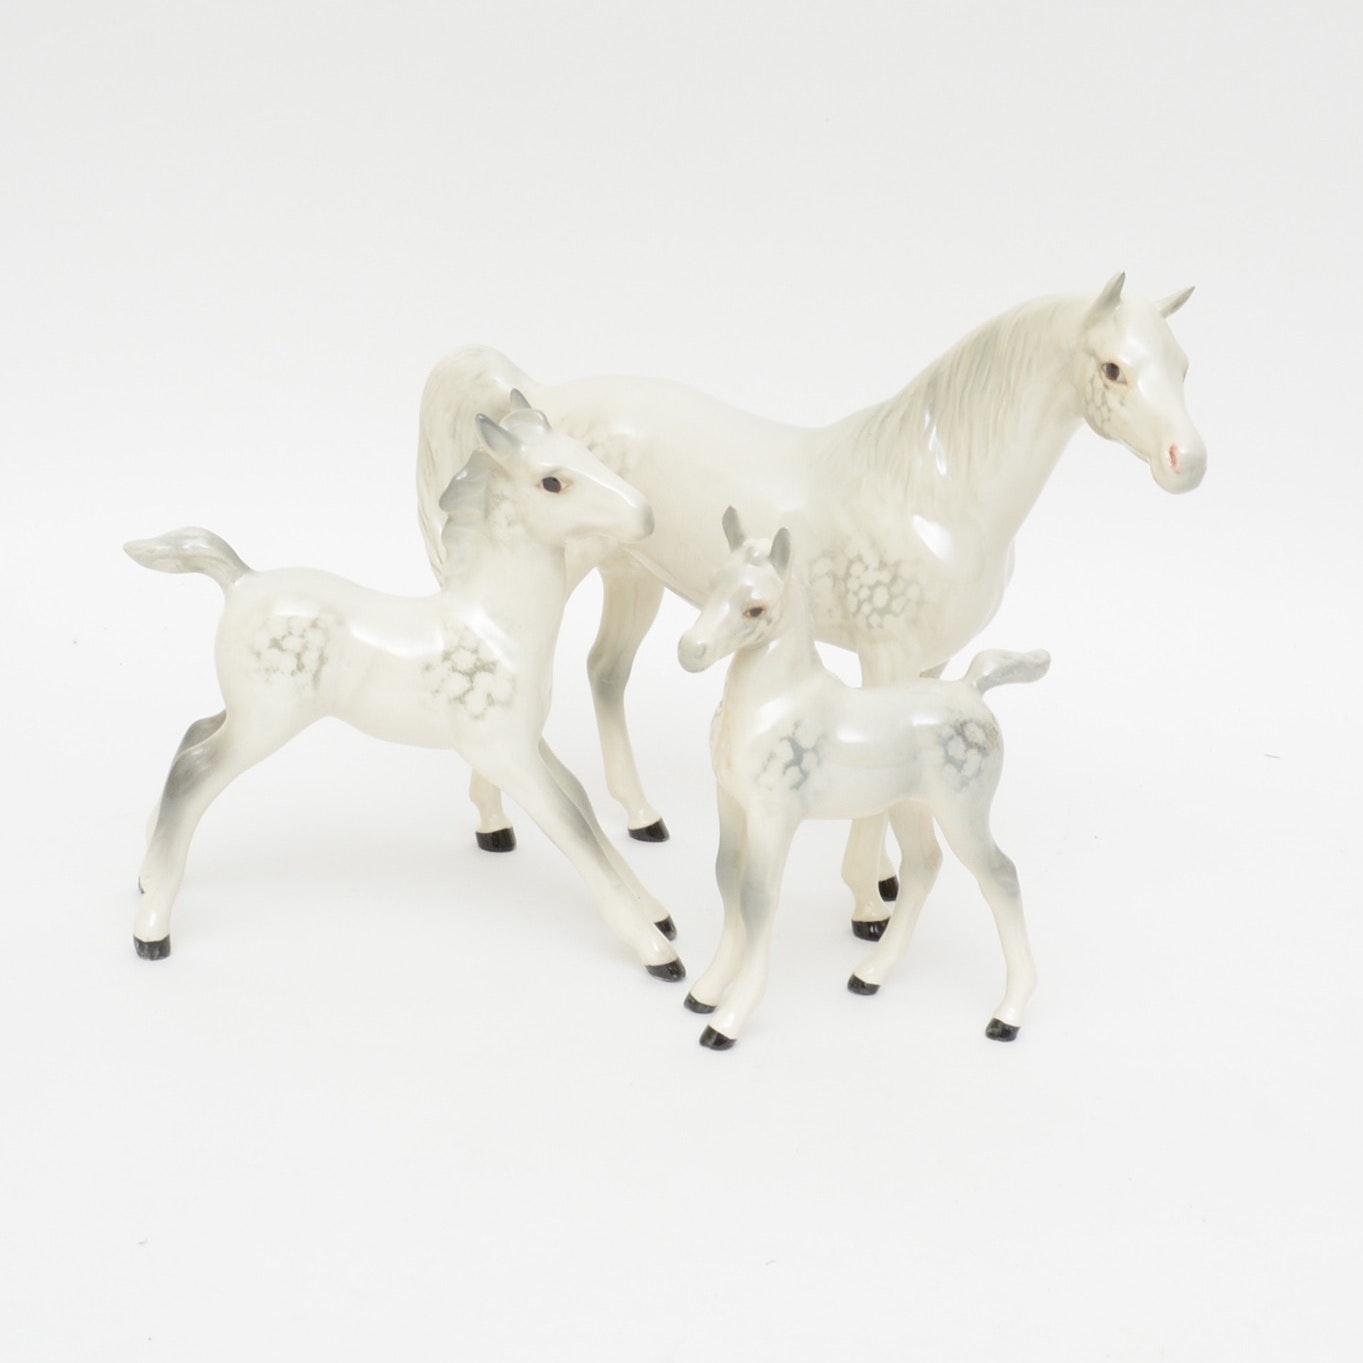 Beswick Porcelain Lippizan Horse Figurines